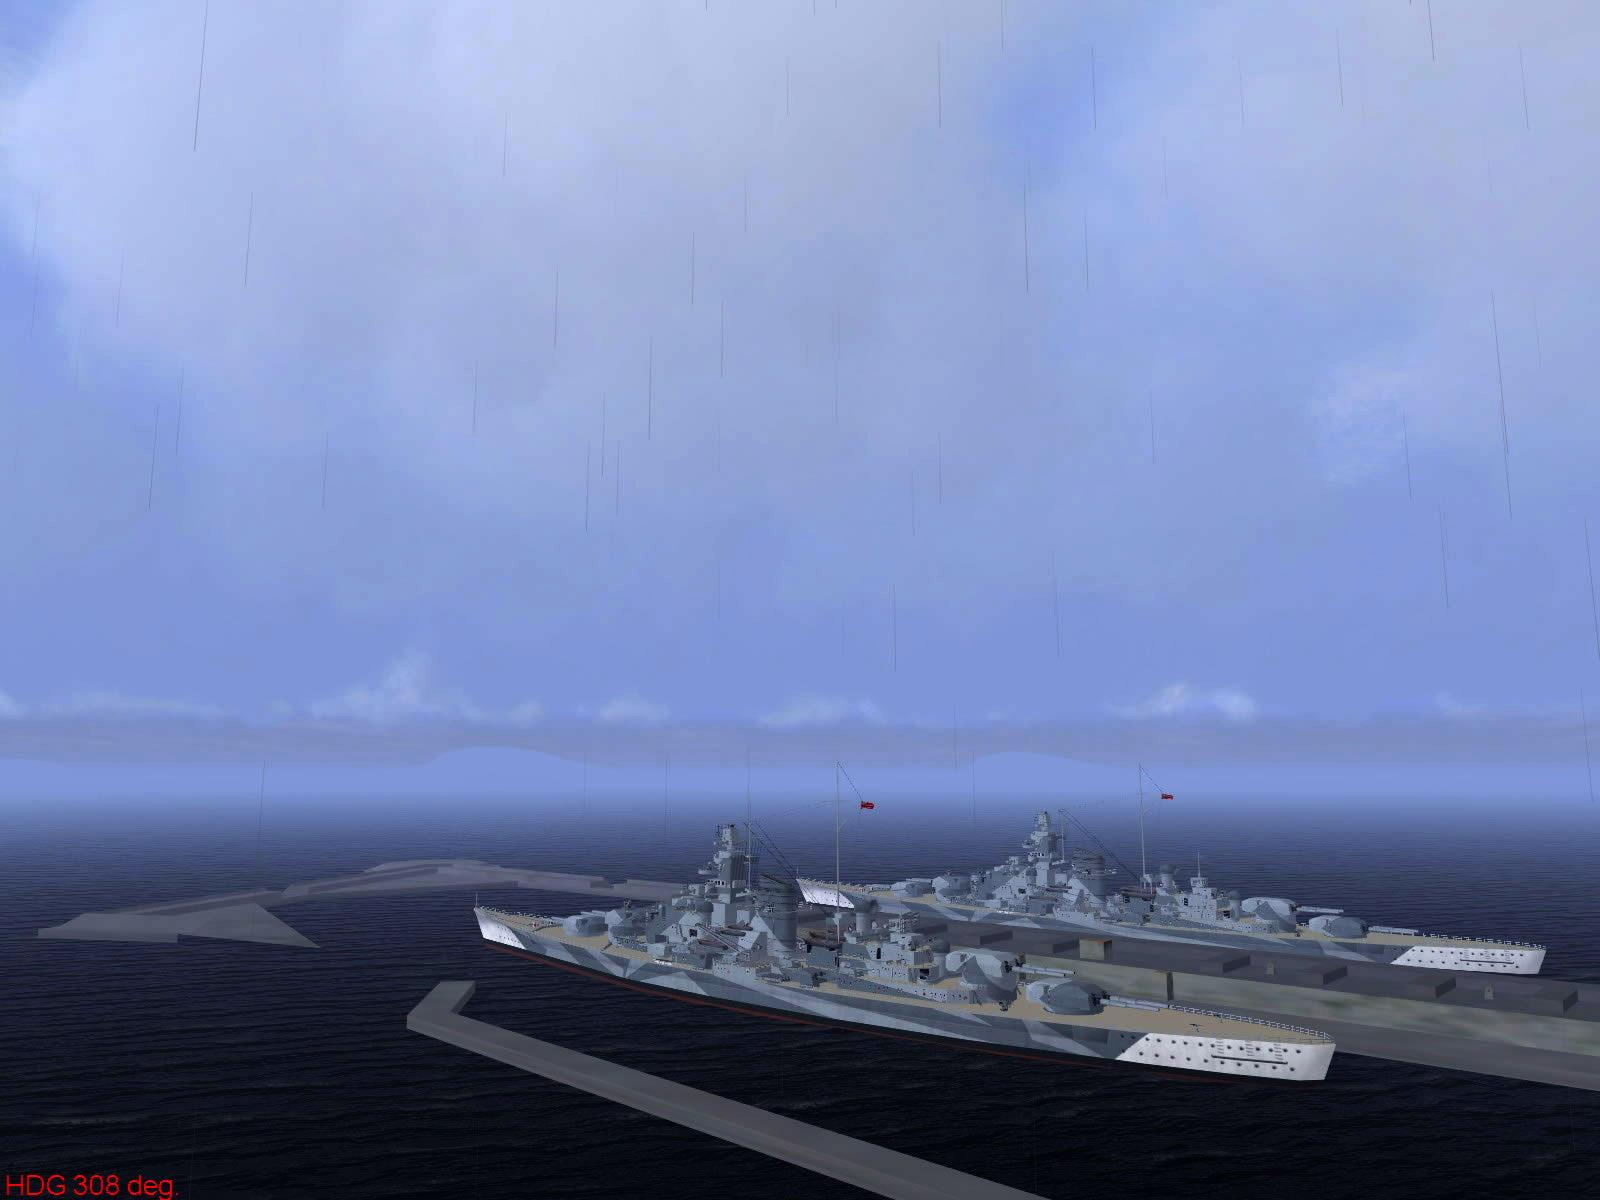 Ubisoft IL2 Sturmovik game version of harbor objets 02